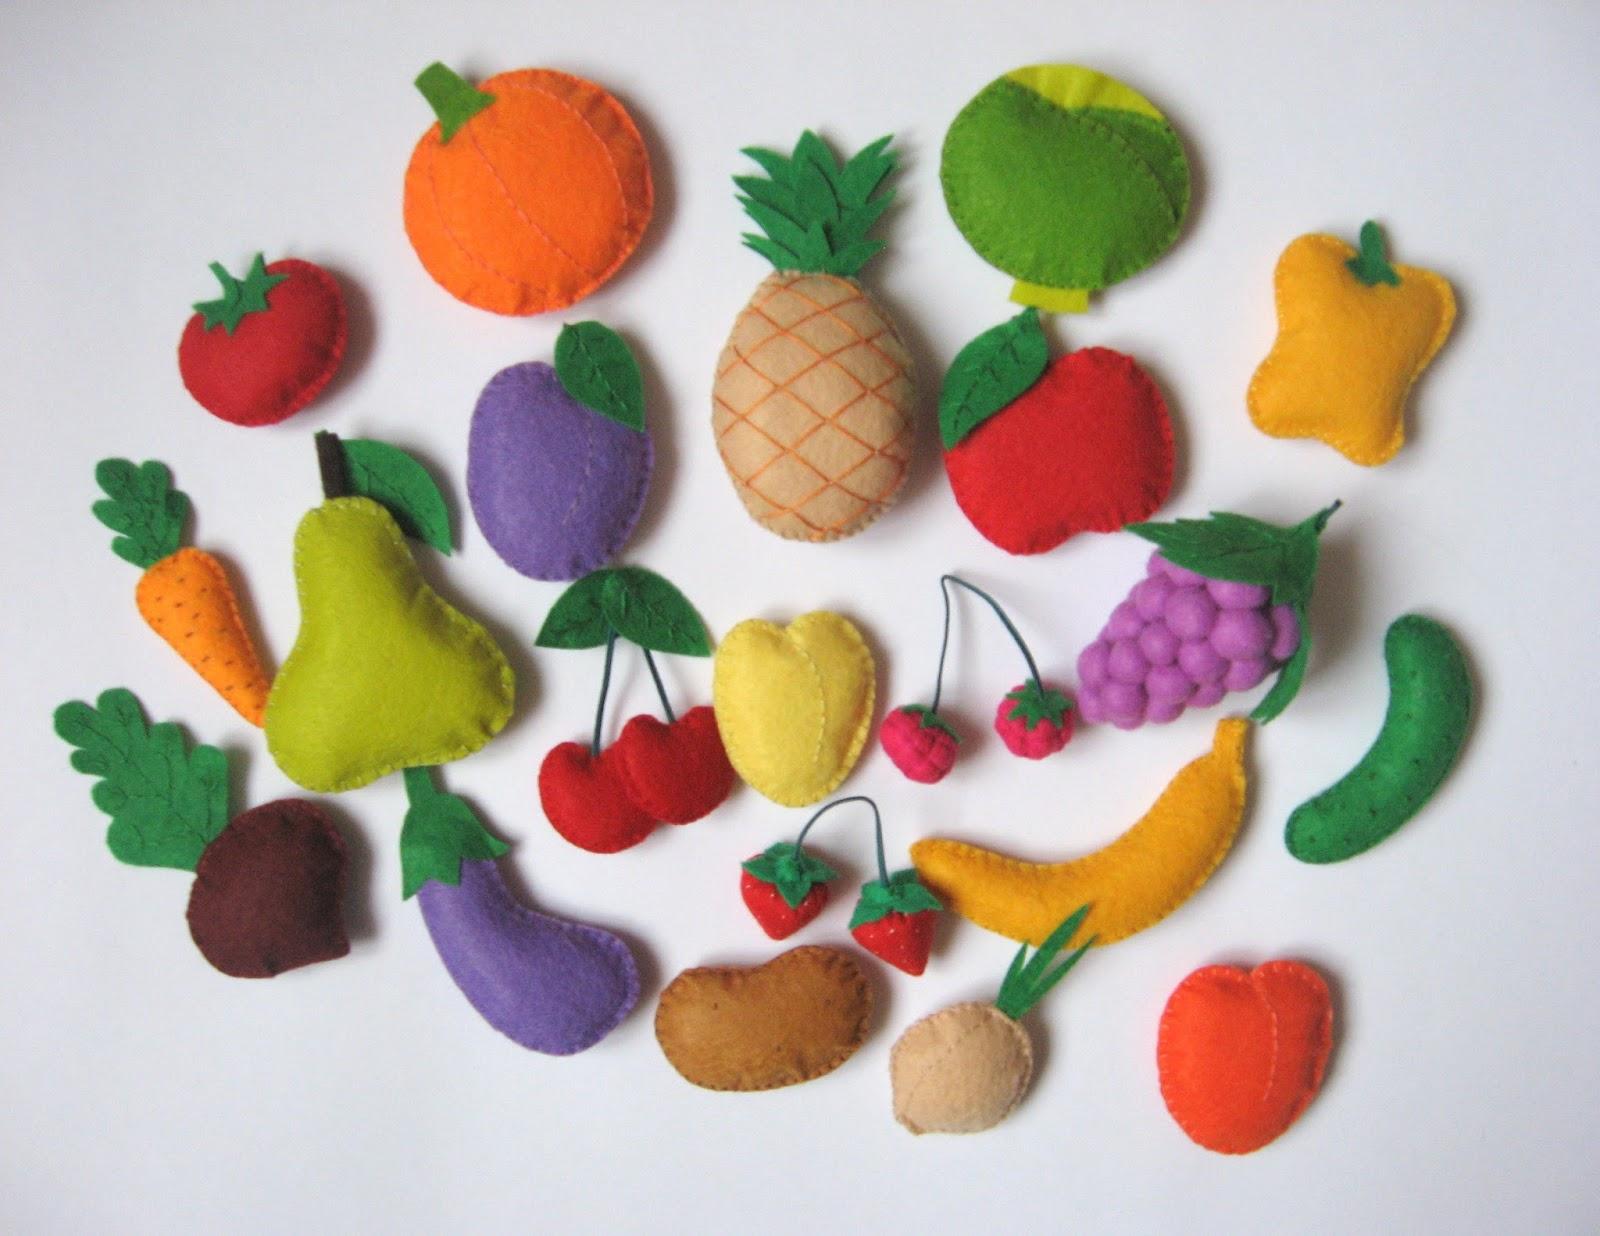 Овощи из фетра своими руками